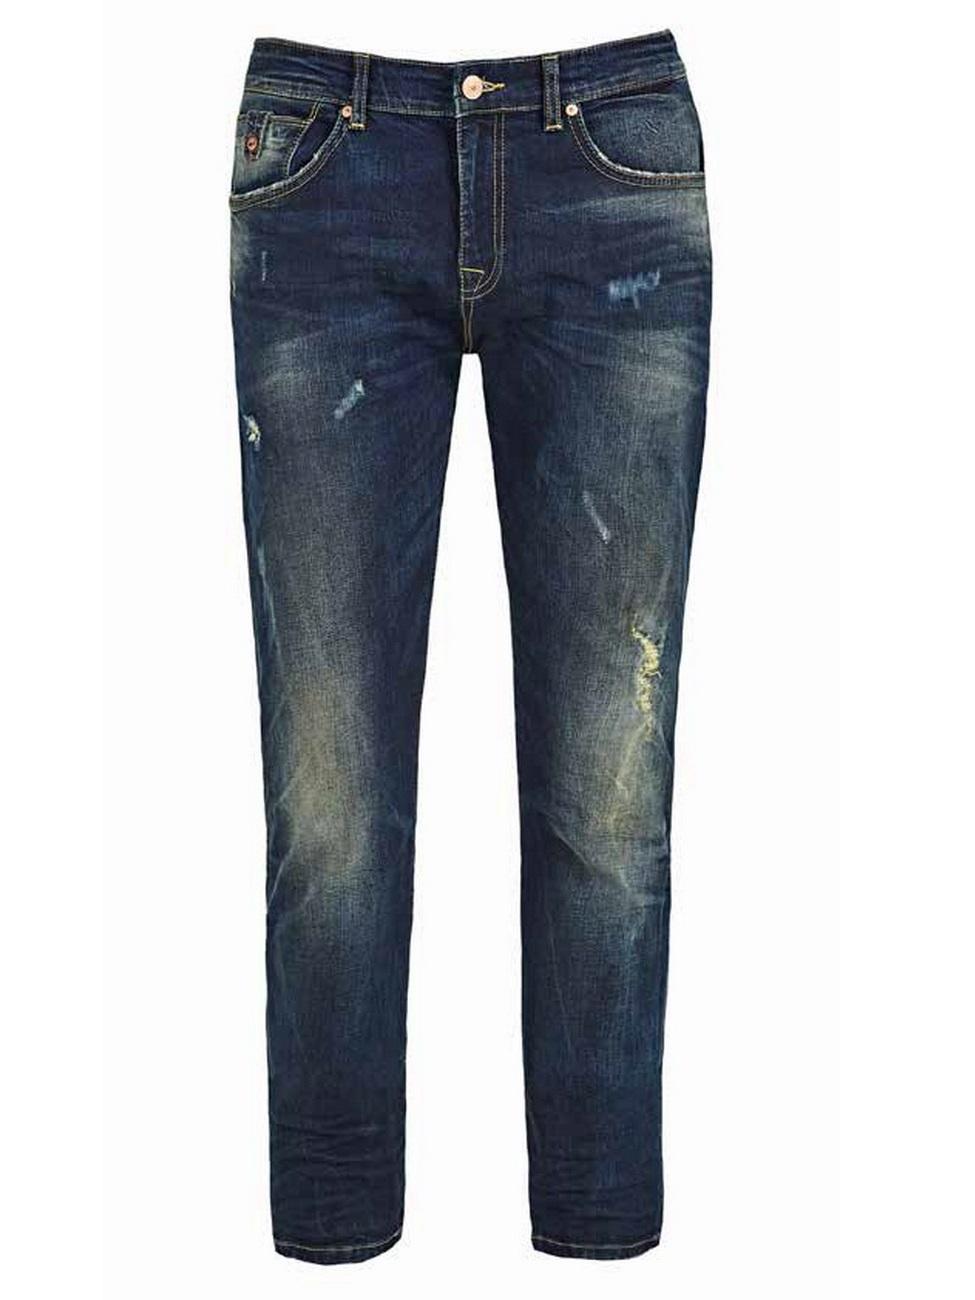 ltb herren jeans joshua slim fit blau arcton wash ebay. Black Bedroom Furniture Sets. Home Design Ideas